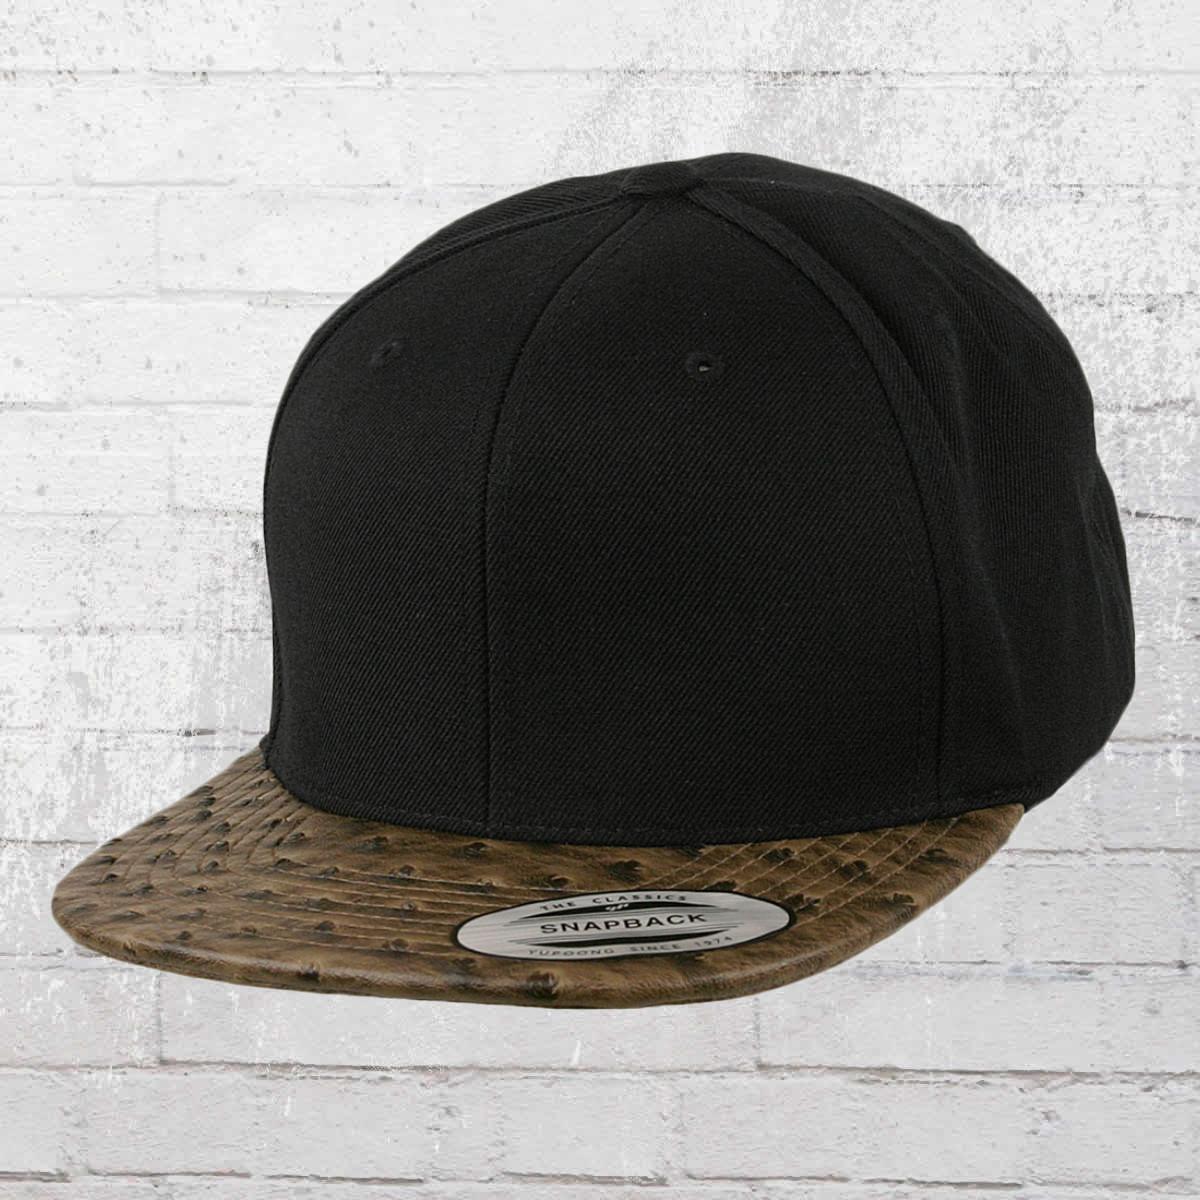 cb595bd5a10ec Yupoong by Flexfit Hat Leather Snapback Cap black ostrich. ›‹ «